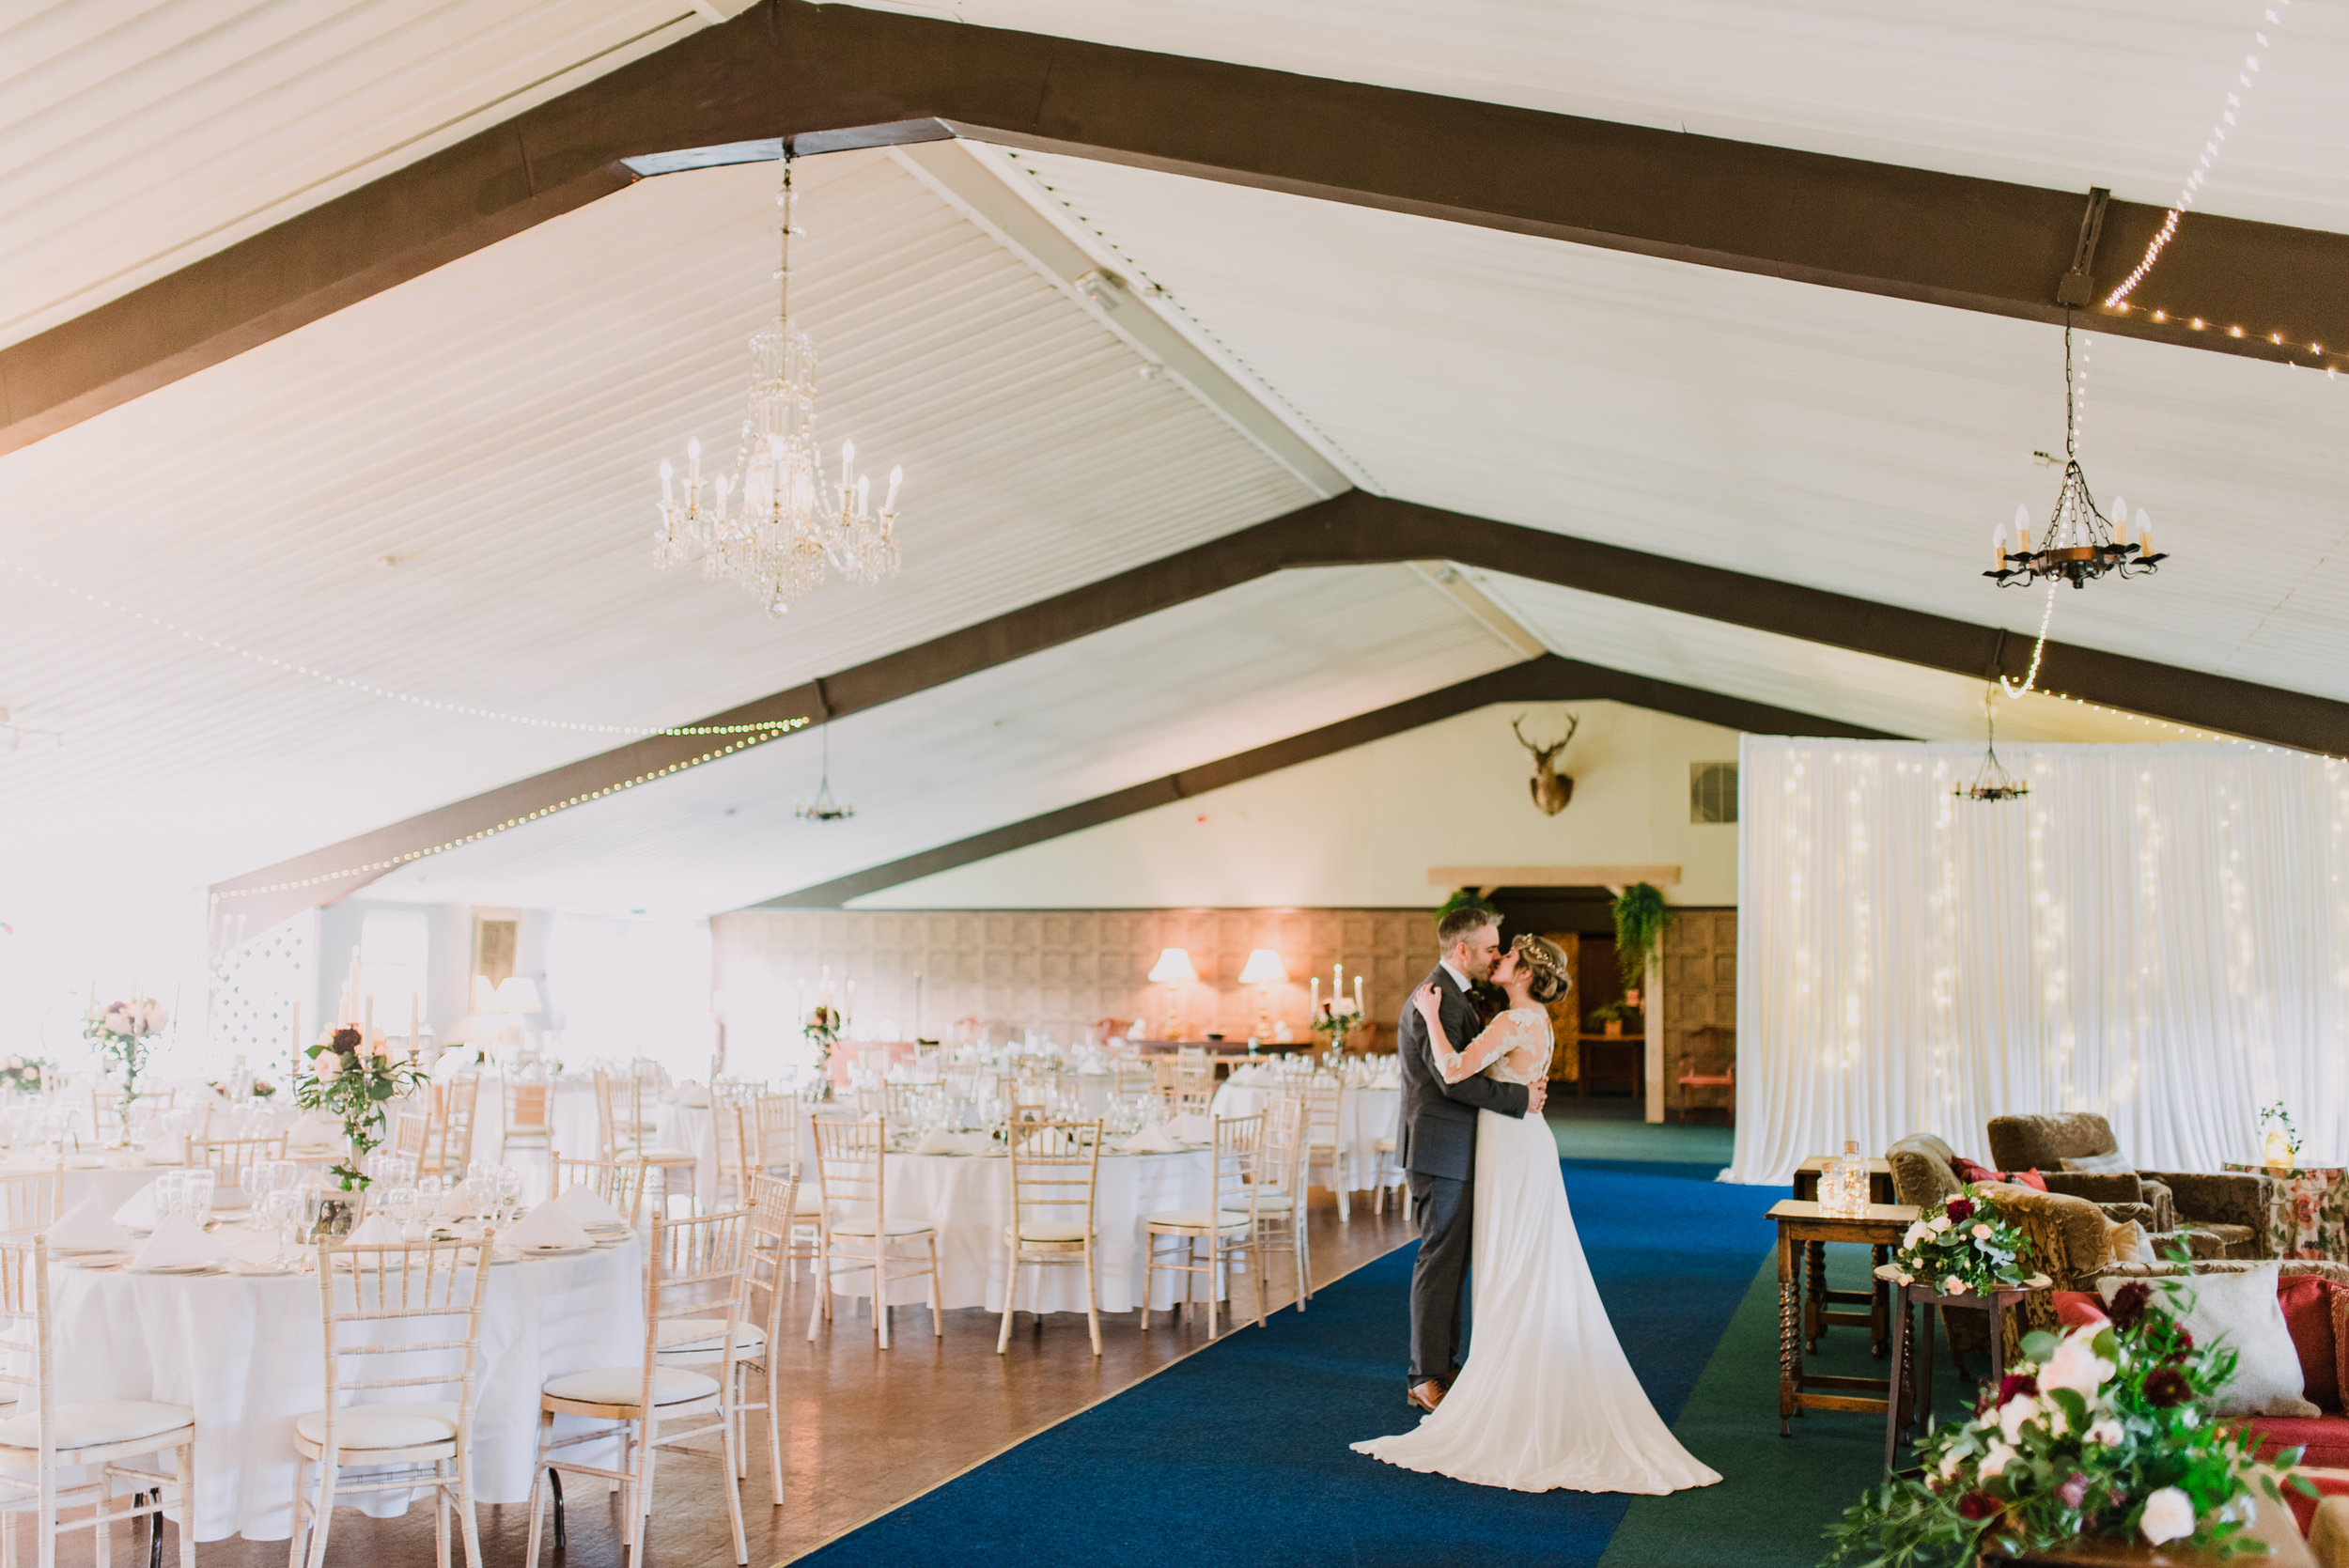 lissanoure castle wedding, northern ireland wedding photographer, romantic northern irish wedding venue, castle wedding ireland, natural wedding photography ni (98).jpg